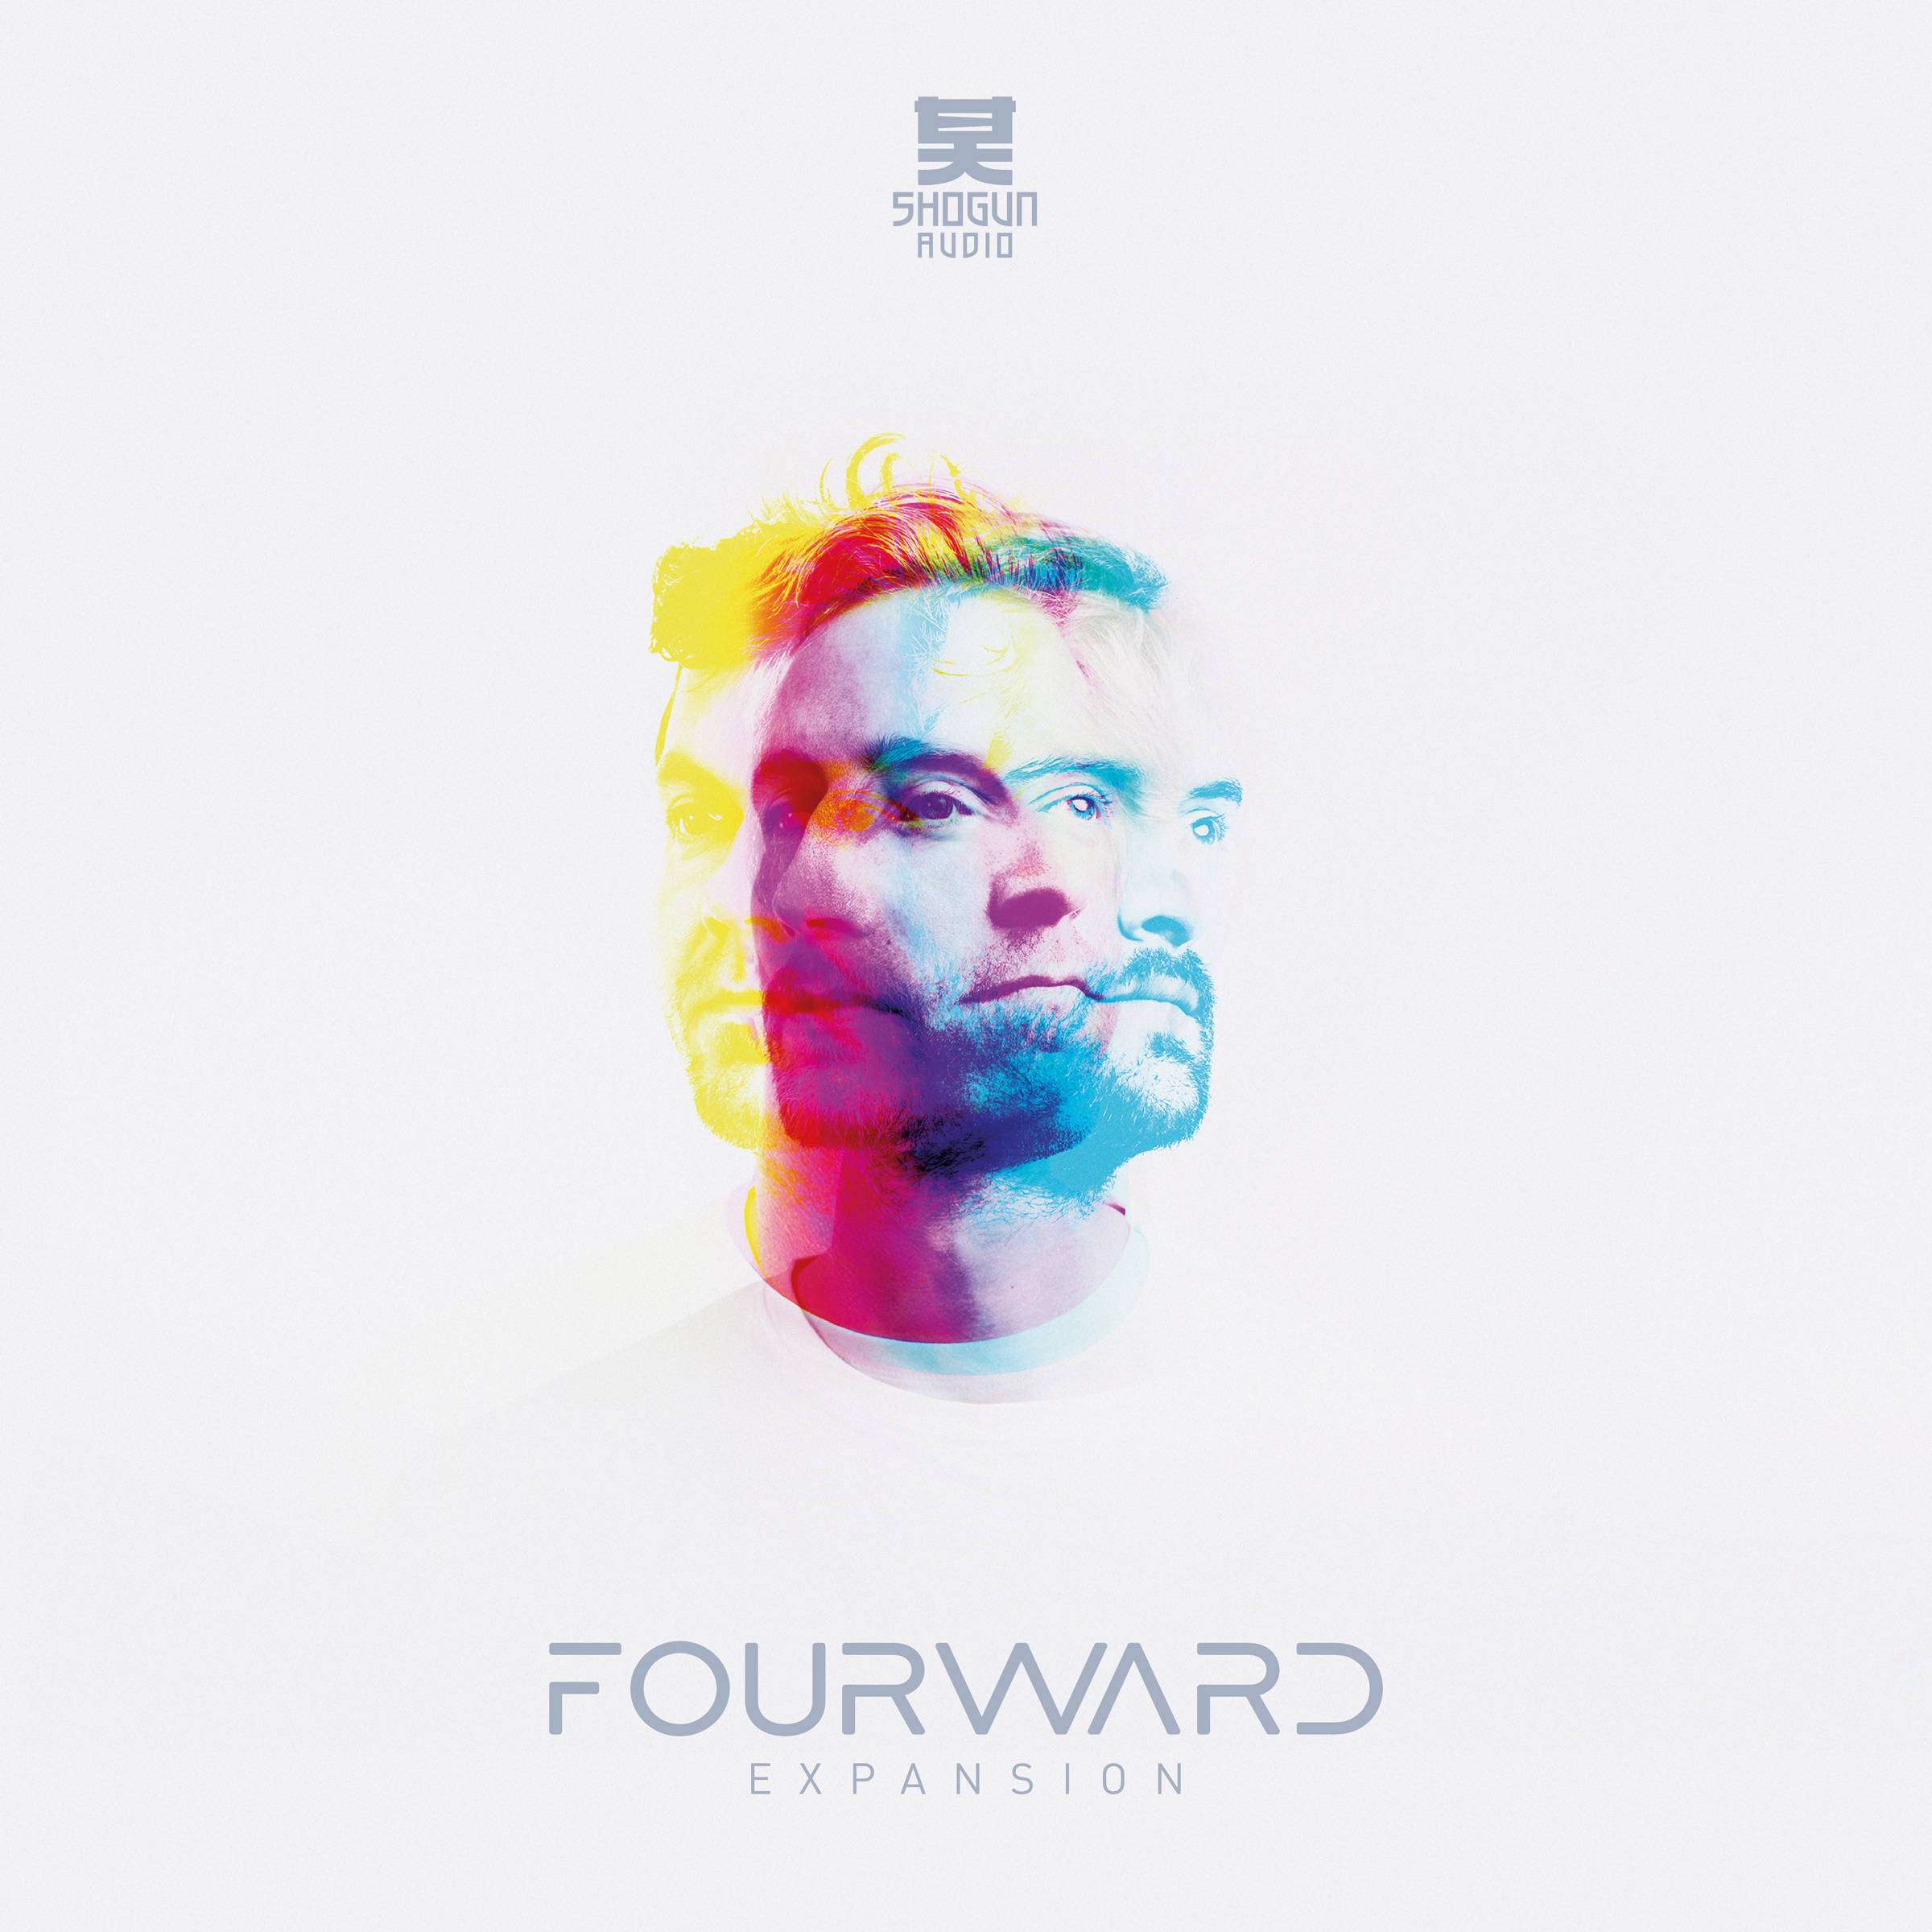 Fourward/EXPANSION CD